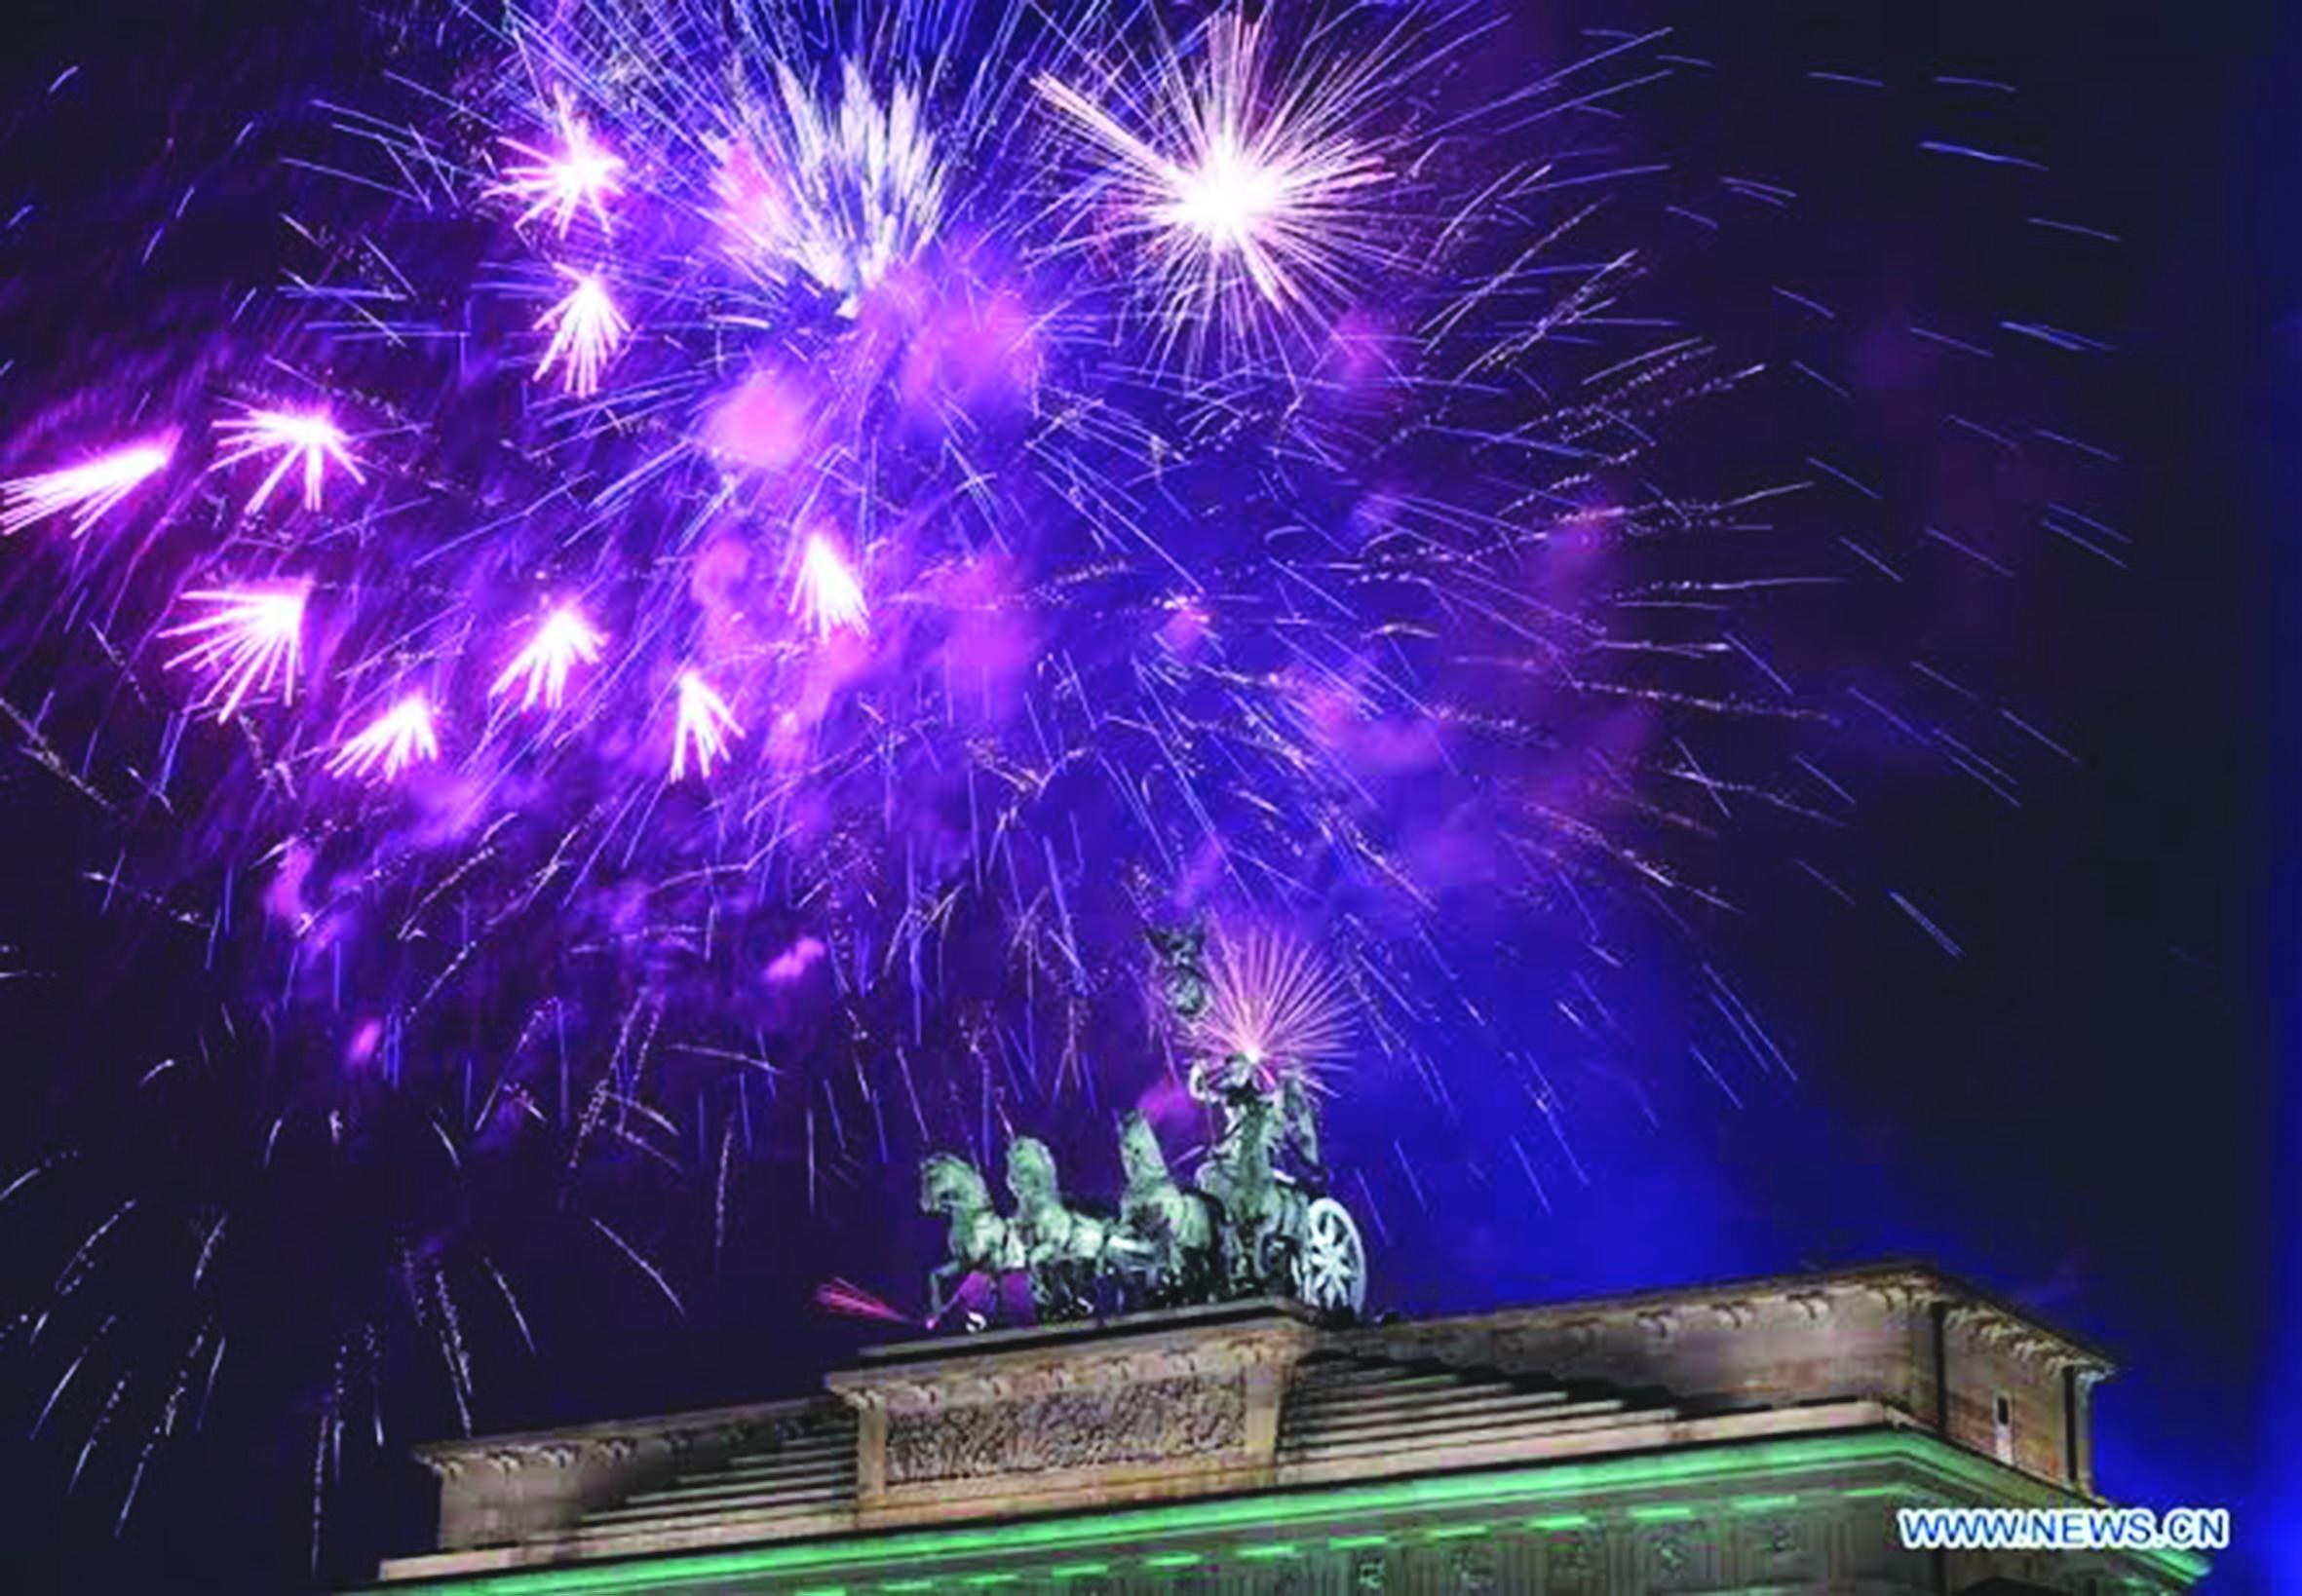 Environmental concerns trigger public debate on fireworks ban in Germany